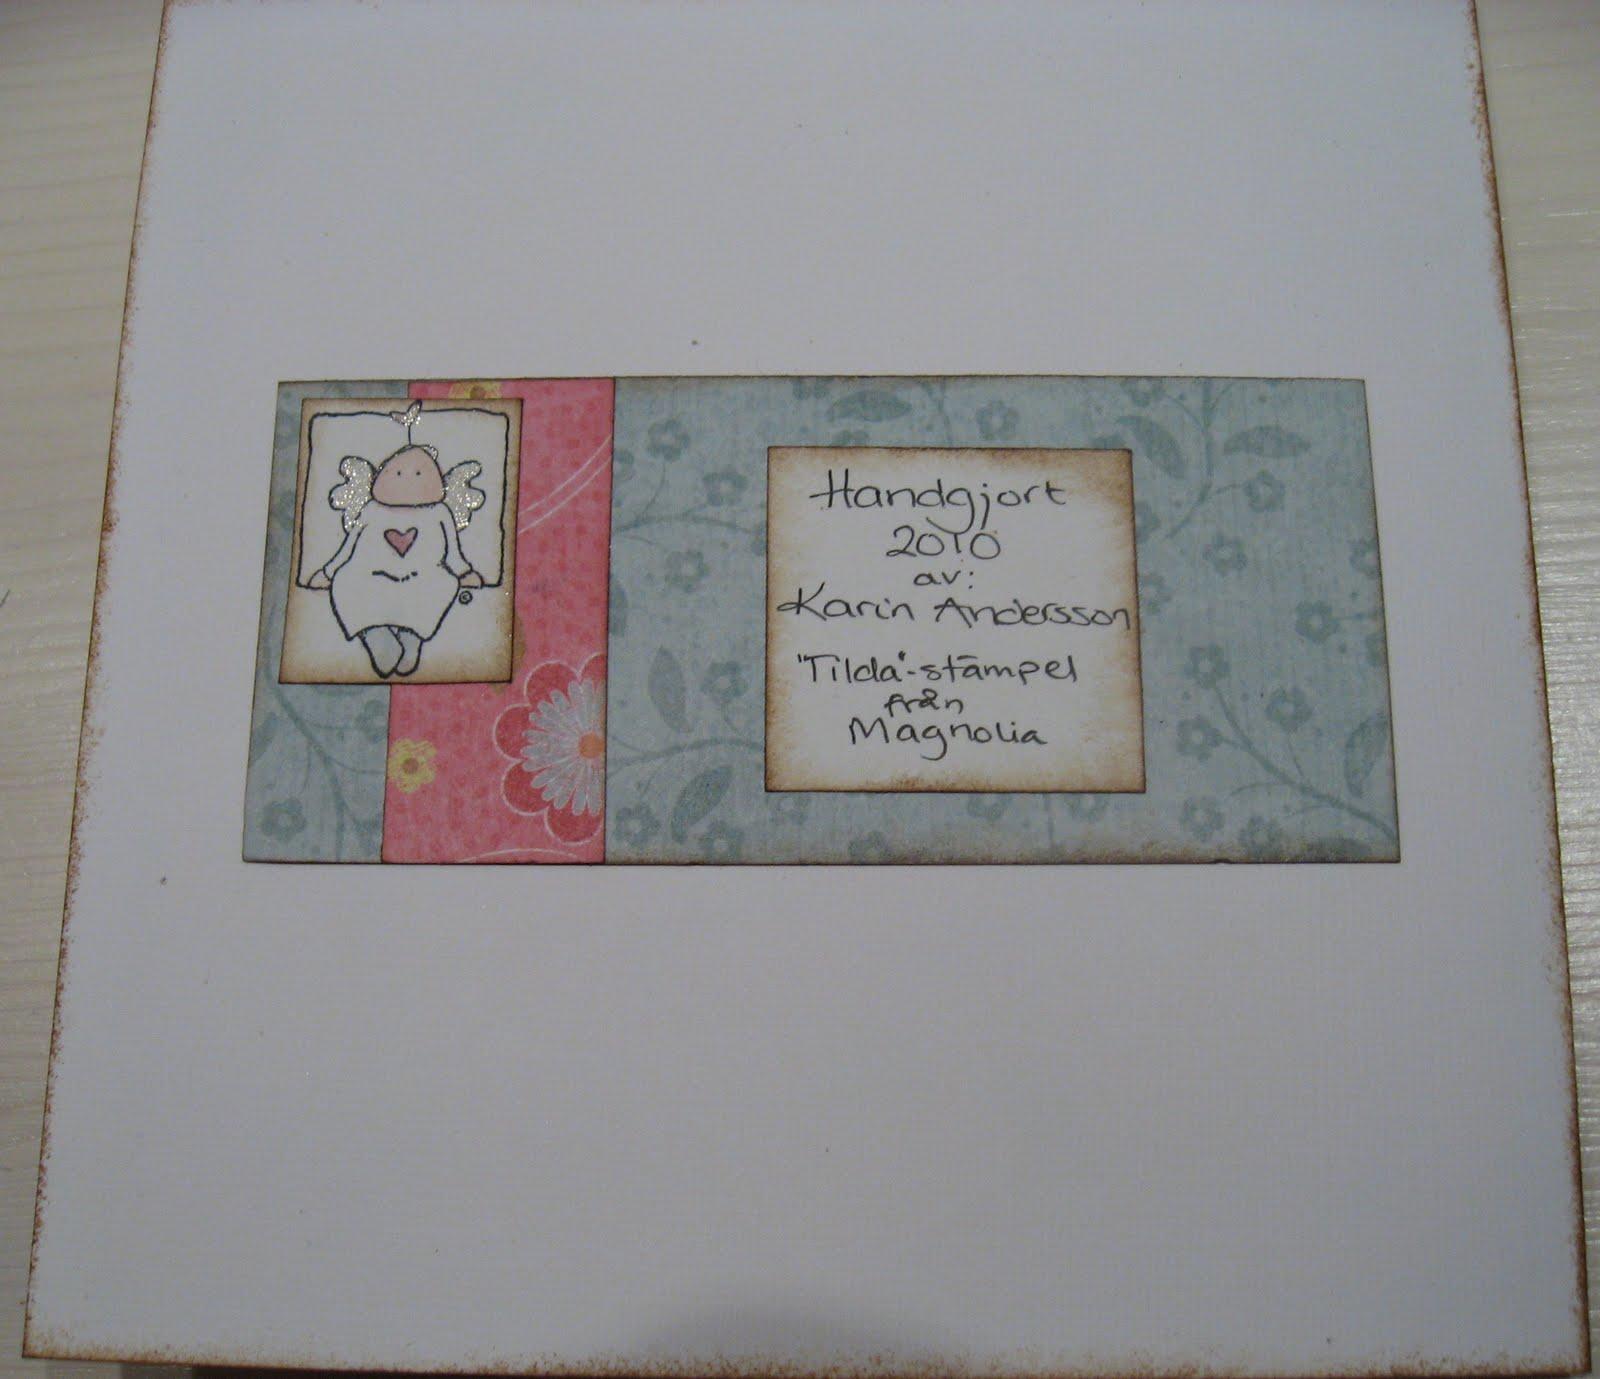 födelsedagskort kille Loreleii's pysselhörna: Födelsedagskort födelsedagskort kille